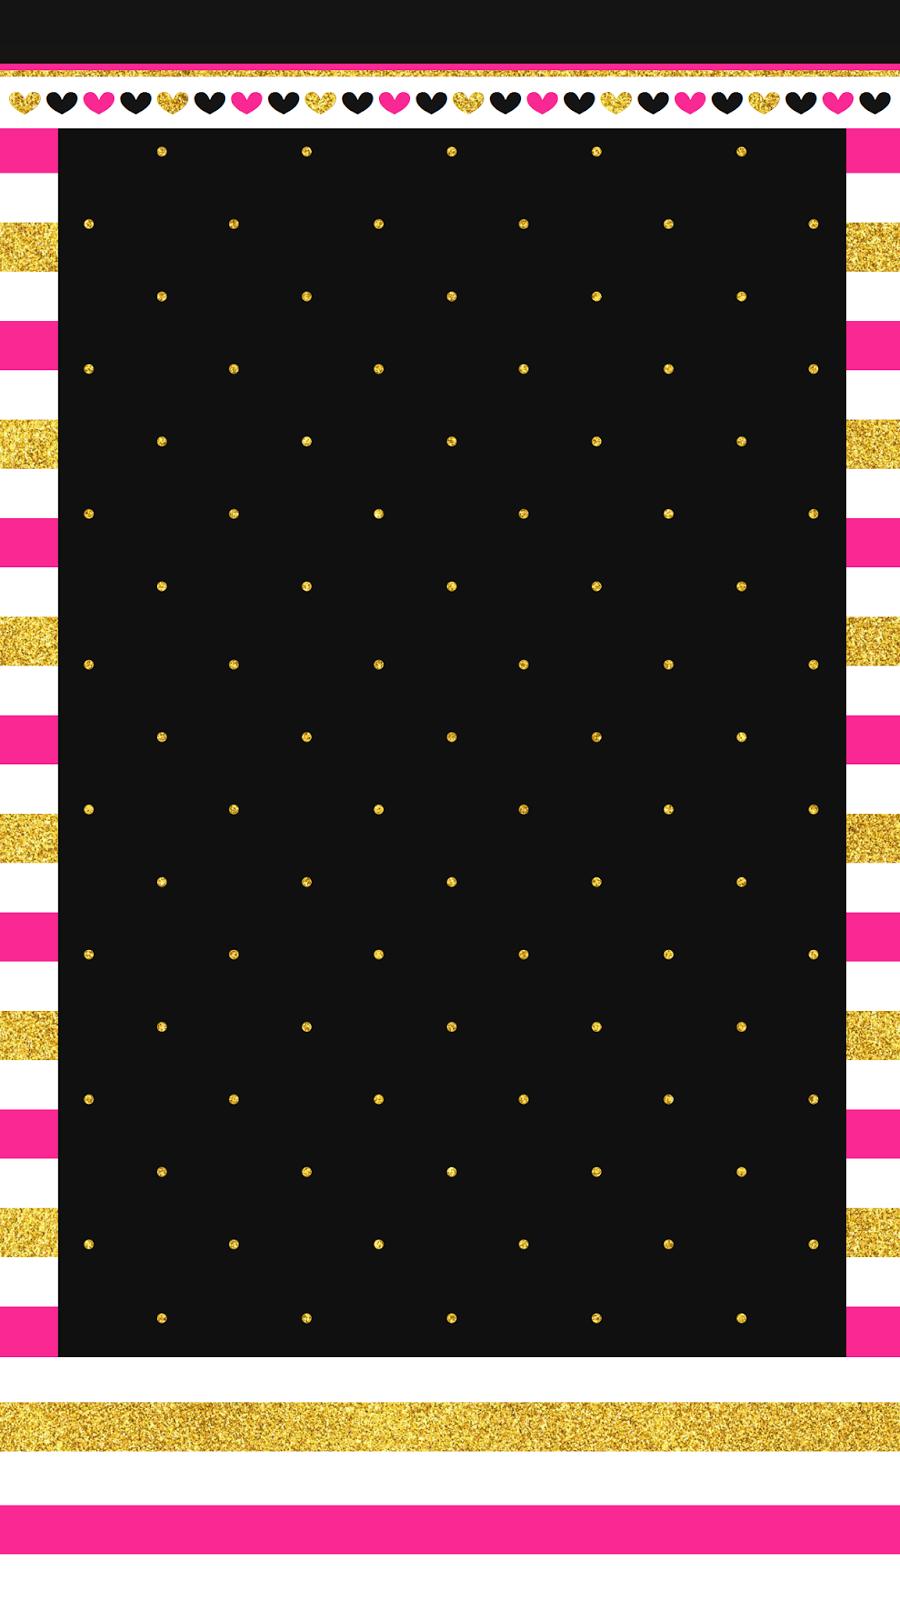 SStripesHearts.png (900×1600)